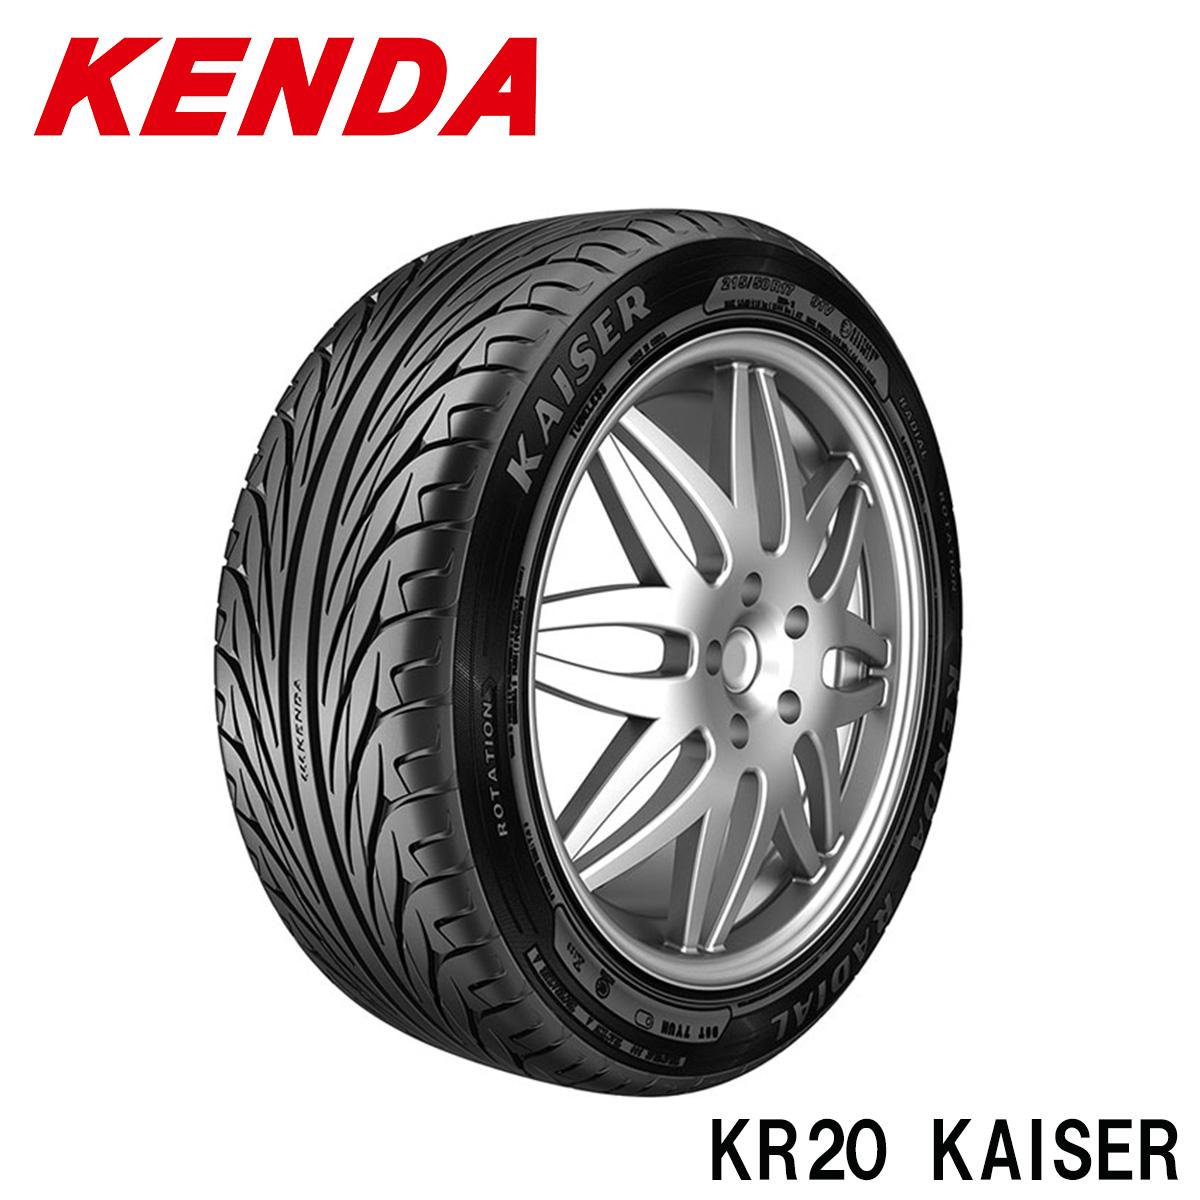 KENDA ケンダ サマータイヤ 2本 17インチ 205/45R17 カイザー KAISER KR20